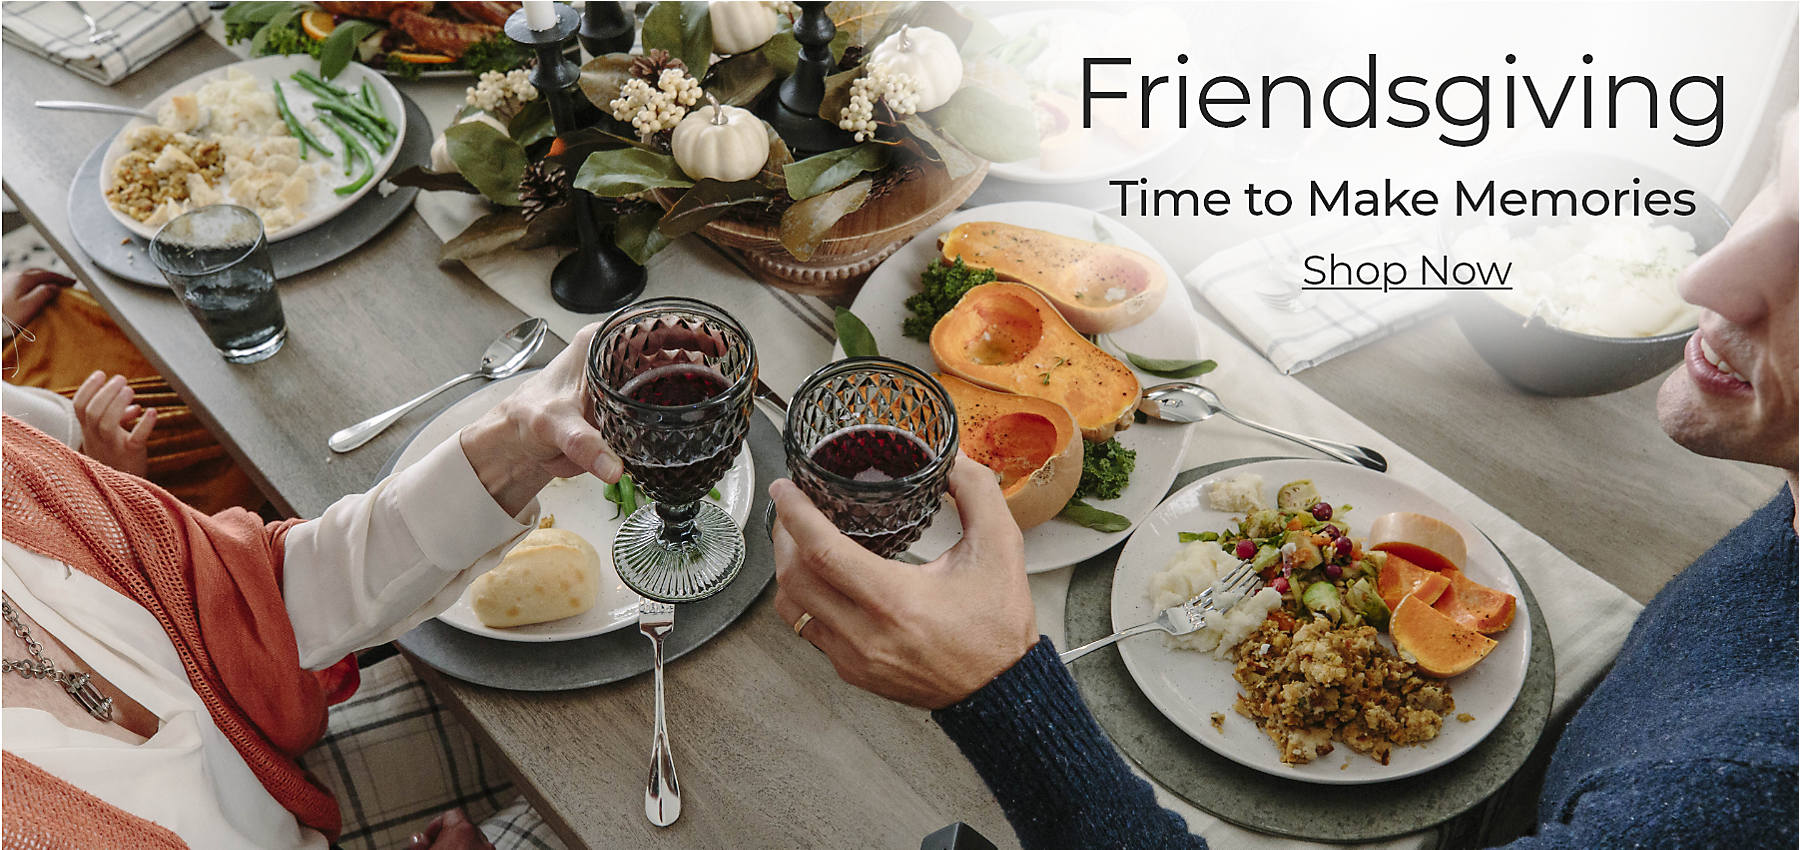 Friendsgiving Time to Make Memories Shop Now